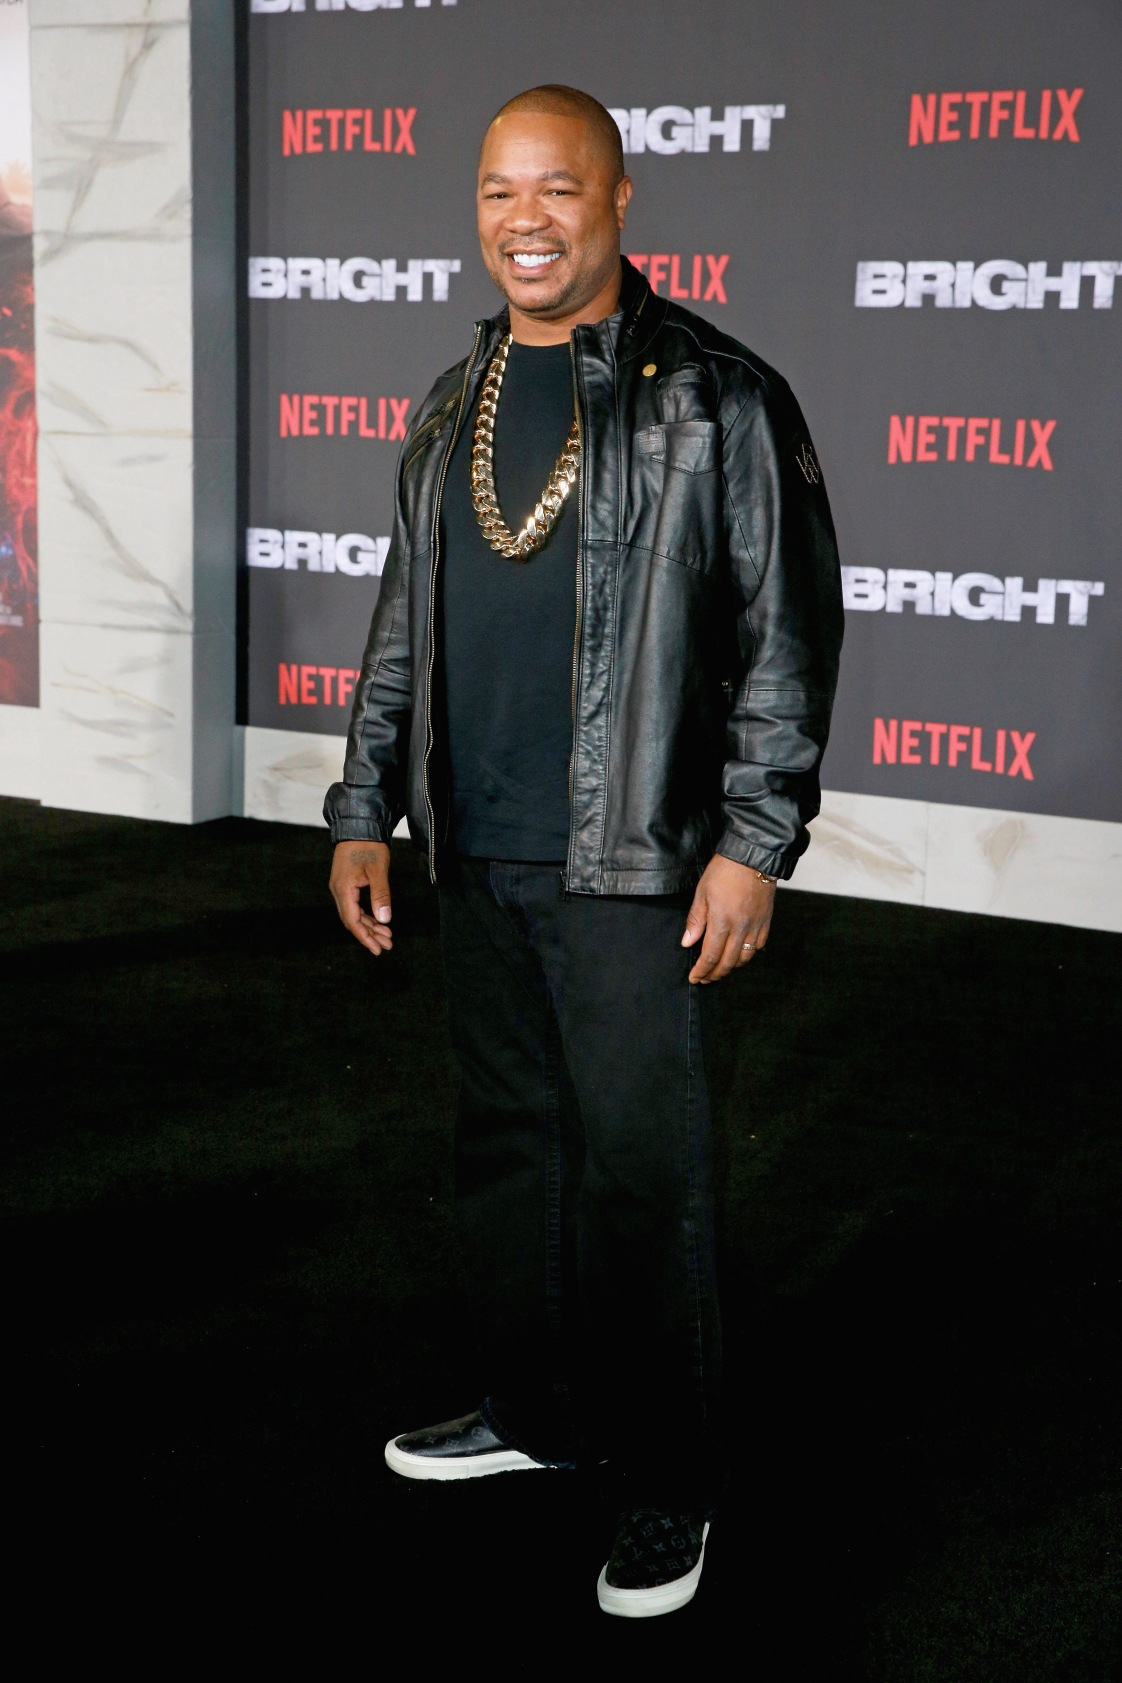 Xzibit attends the LA Premiere of Netflix Films 'BRIGHT' on December 13, 2017 in Los Angeles, California.